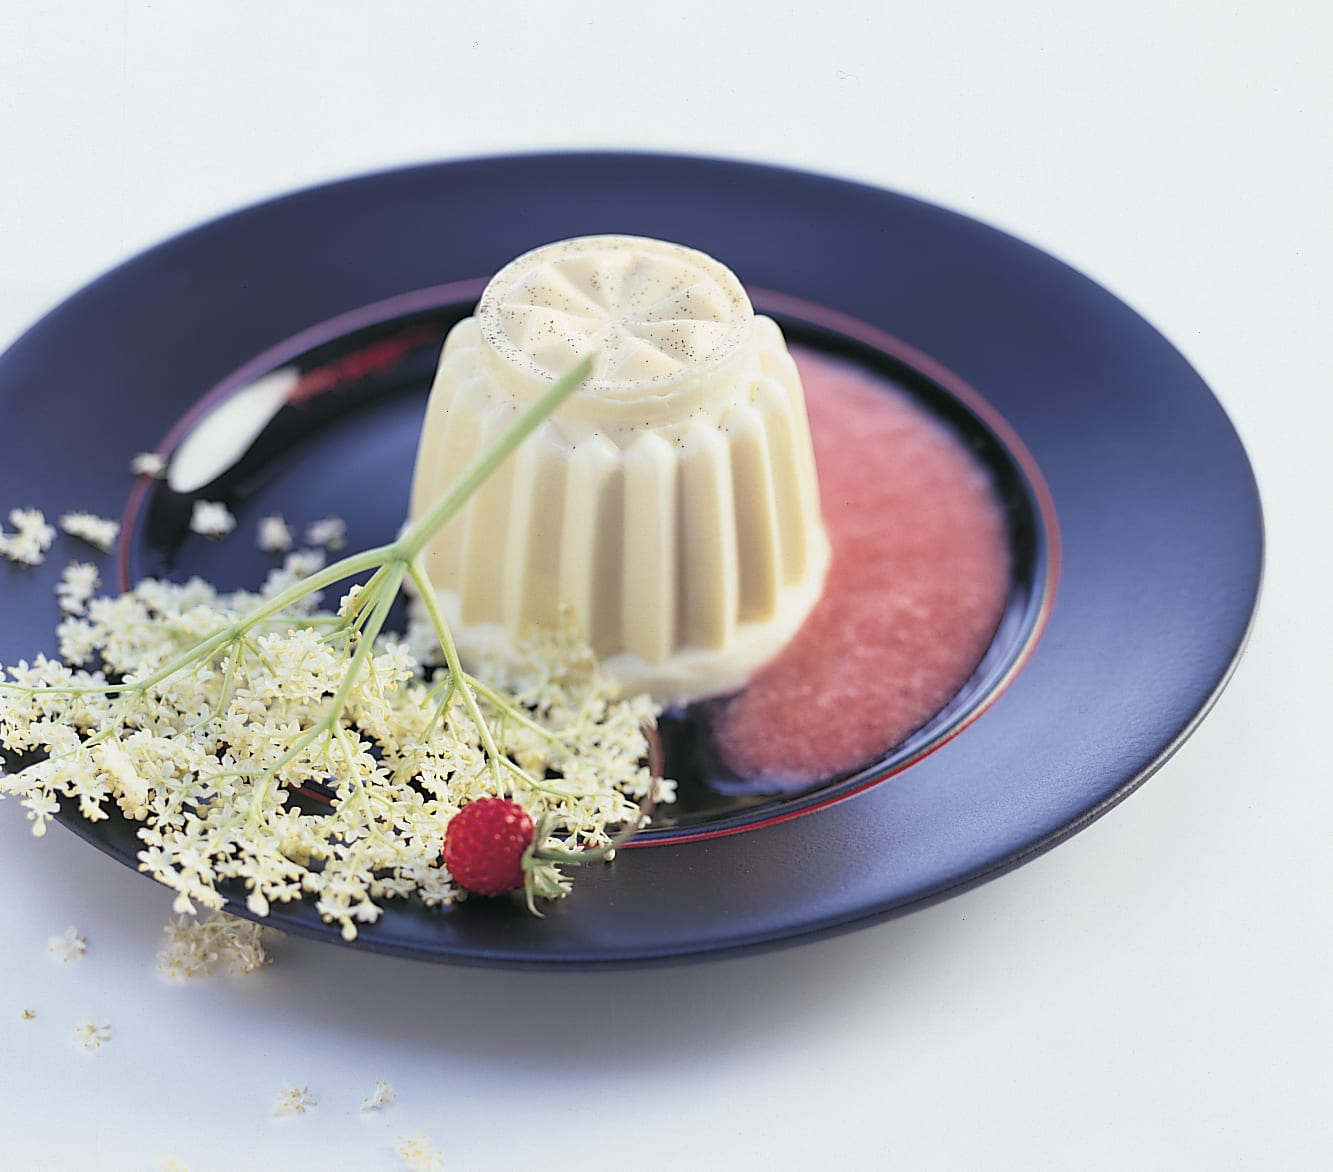 Holunderblüten-Panna-cotta mit Erdbeersauce